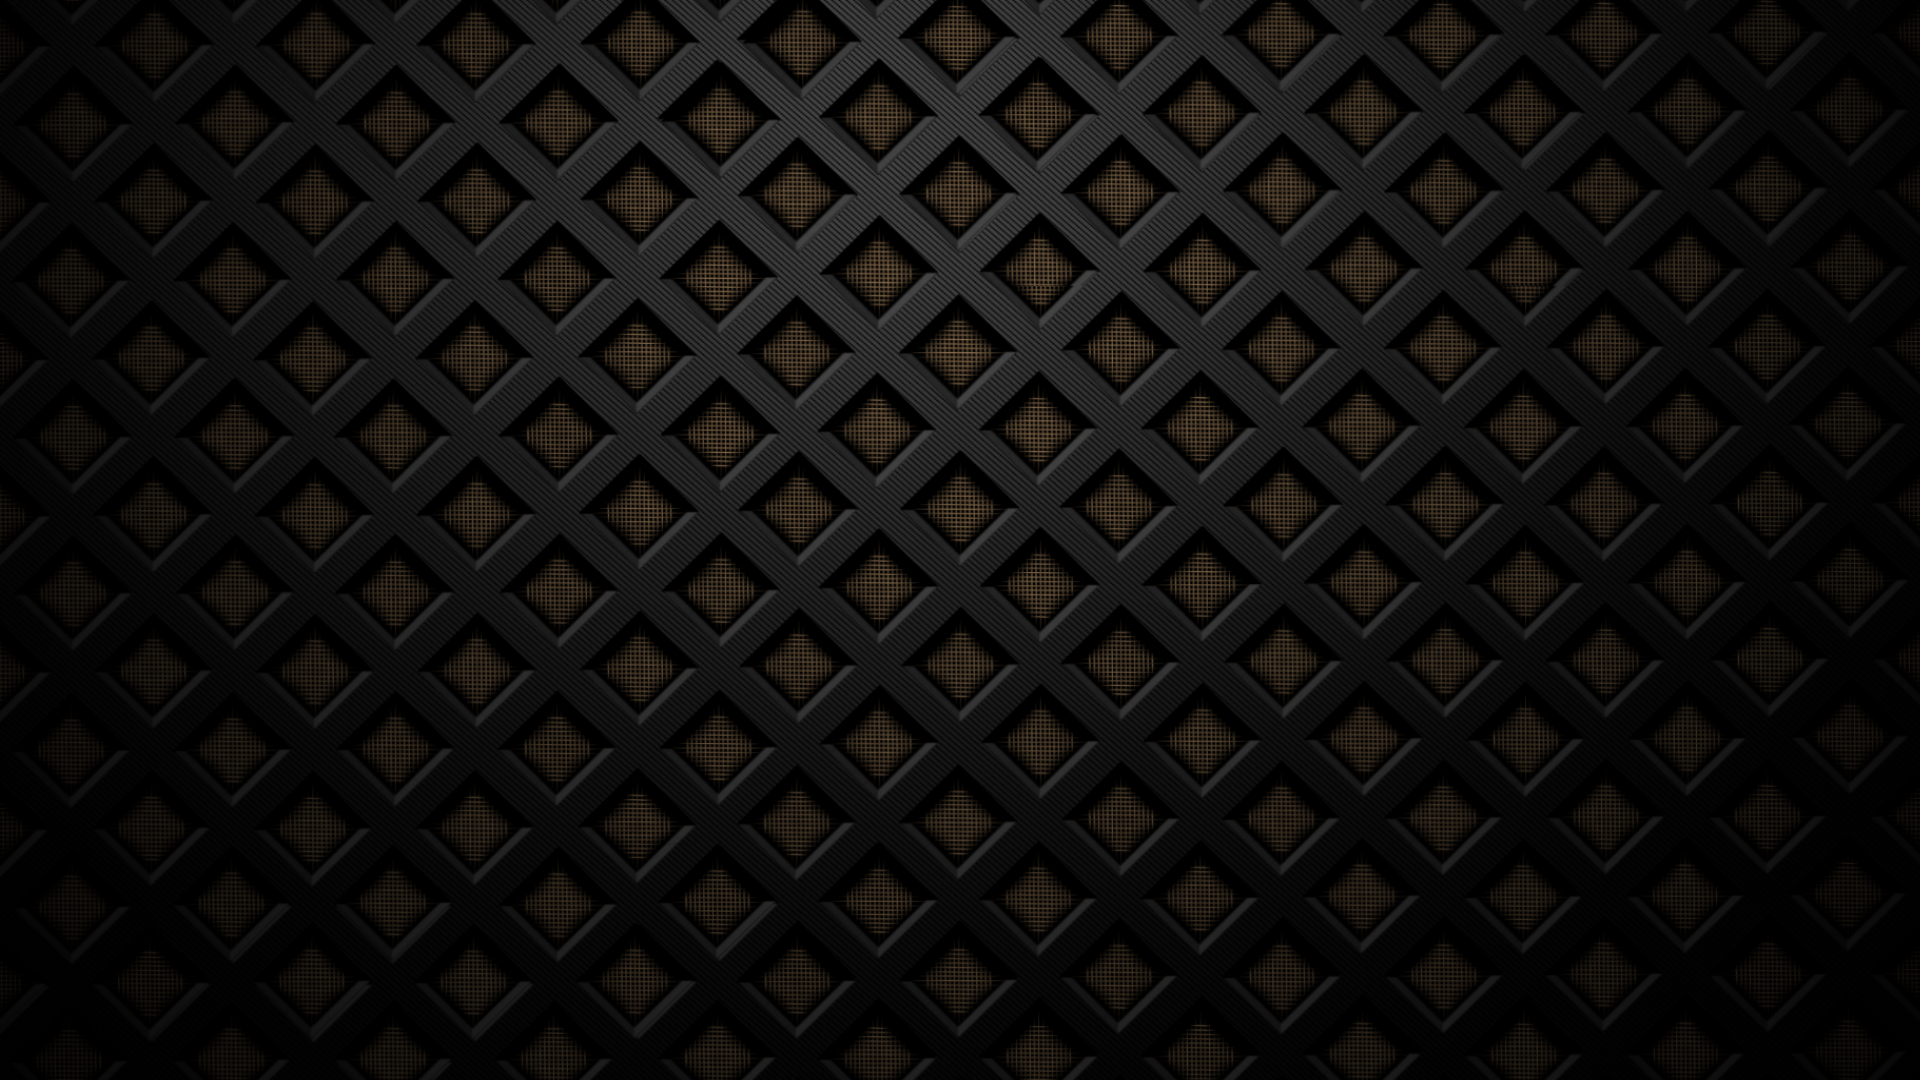 74 Hd Texture Wallpaper On Wallpapersafari